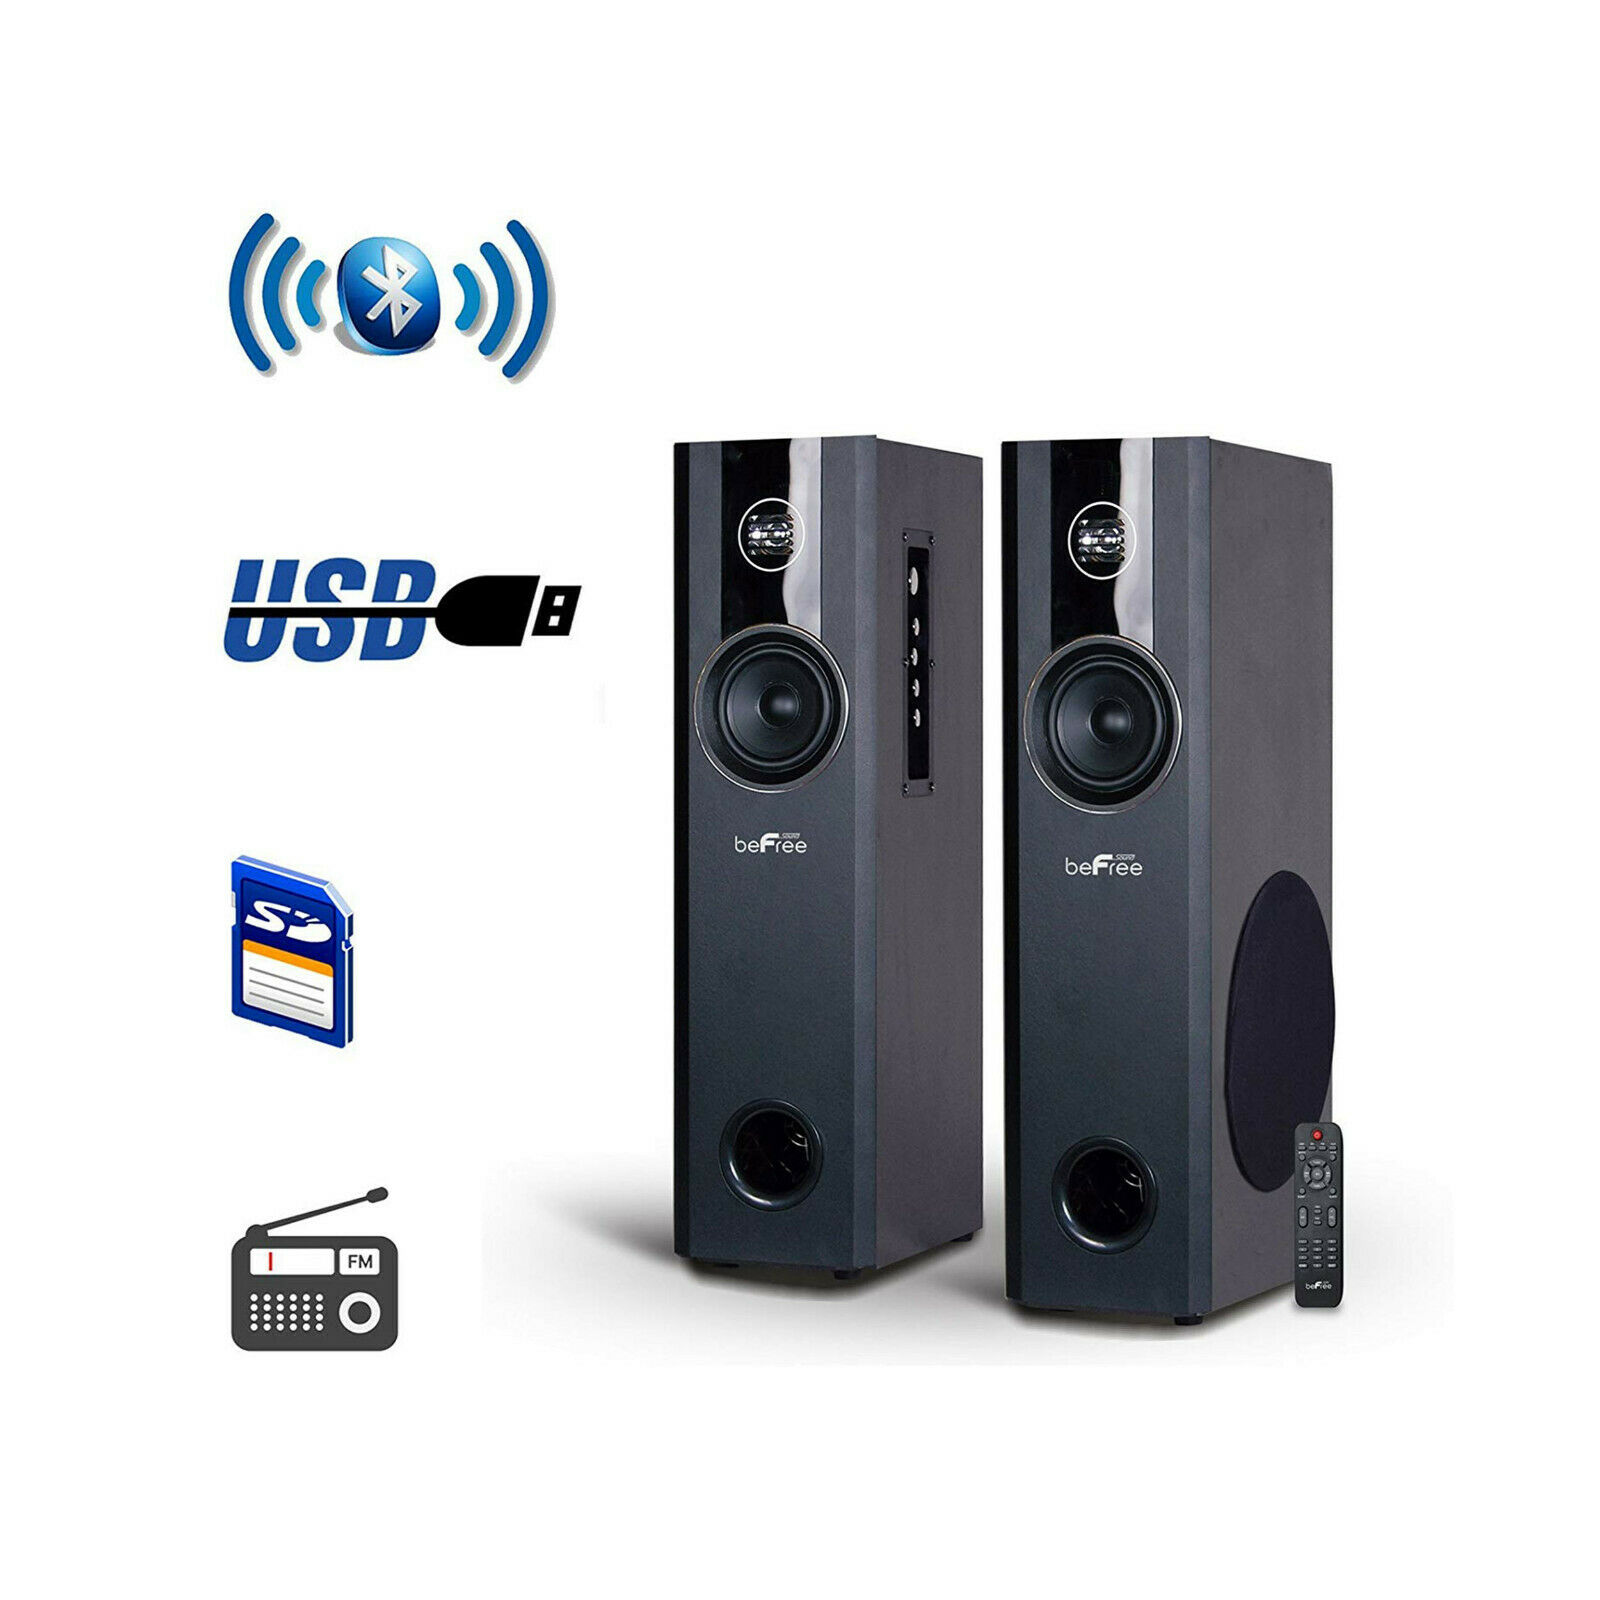 2.1CH BLUETOOTH POWERED TOWER SPEAKERS FM RADIO USB MP3 PLAY